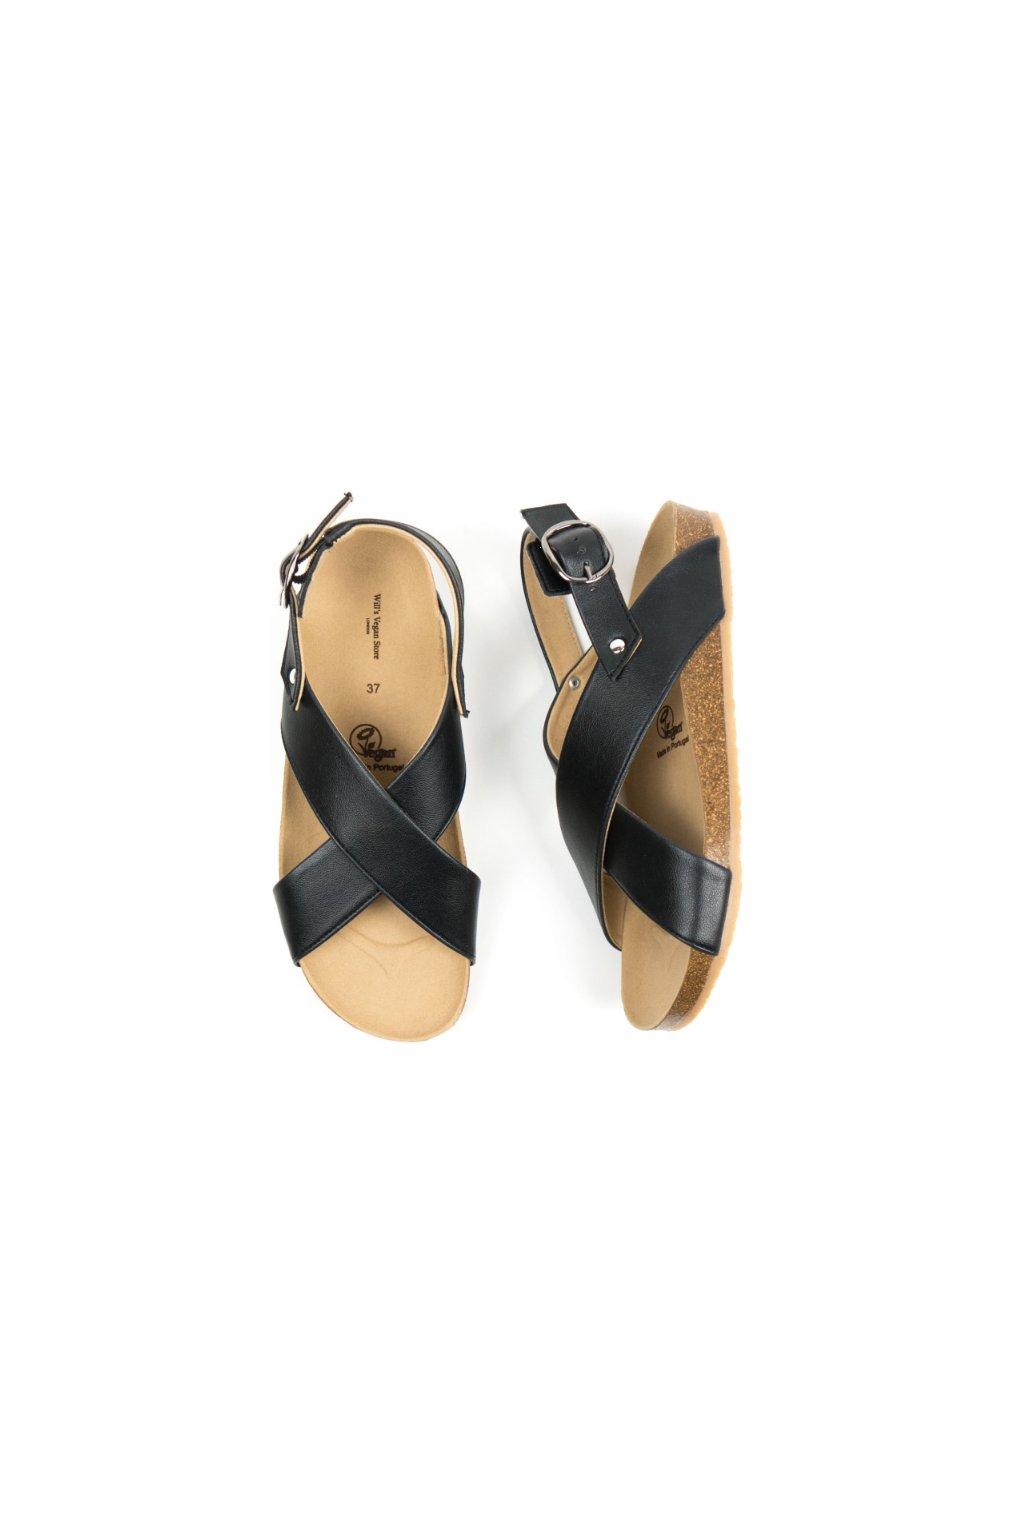 "Čierne sandále z biooleja ""Huarache Footbed Sandals"" - starý model"